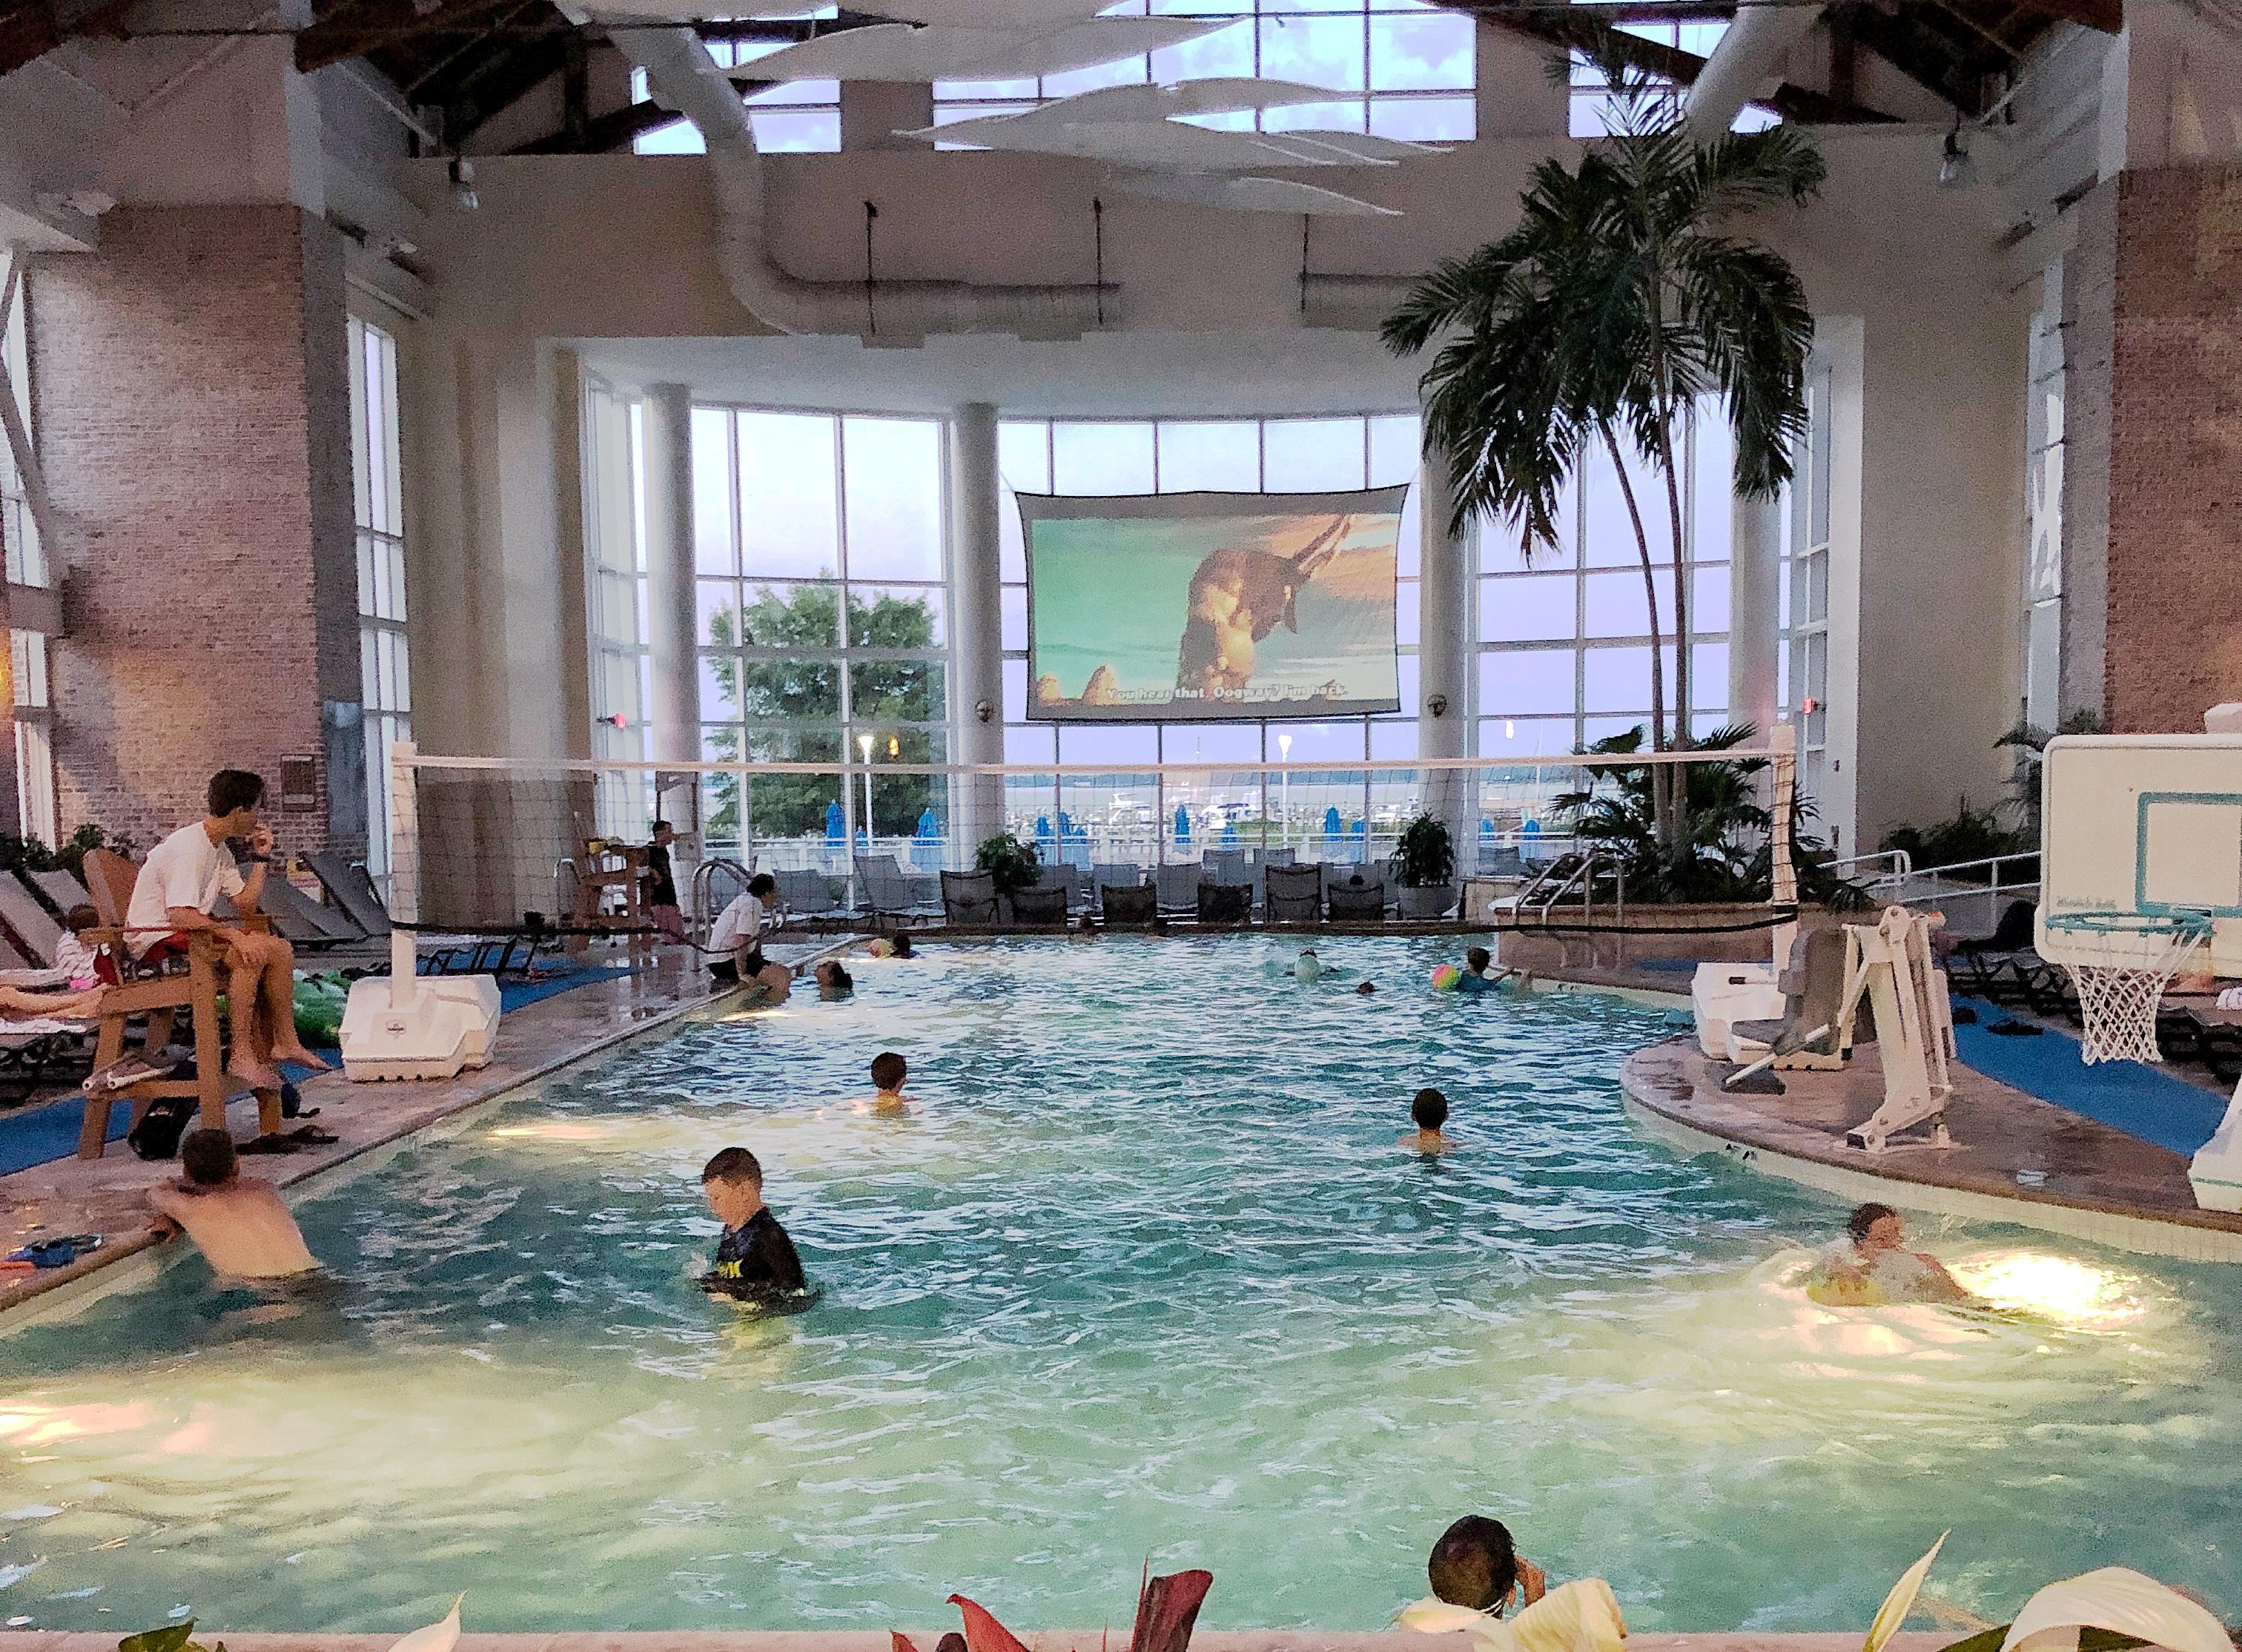 Dive-in movie in the pool at the Hyatt Chesapeake